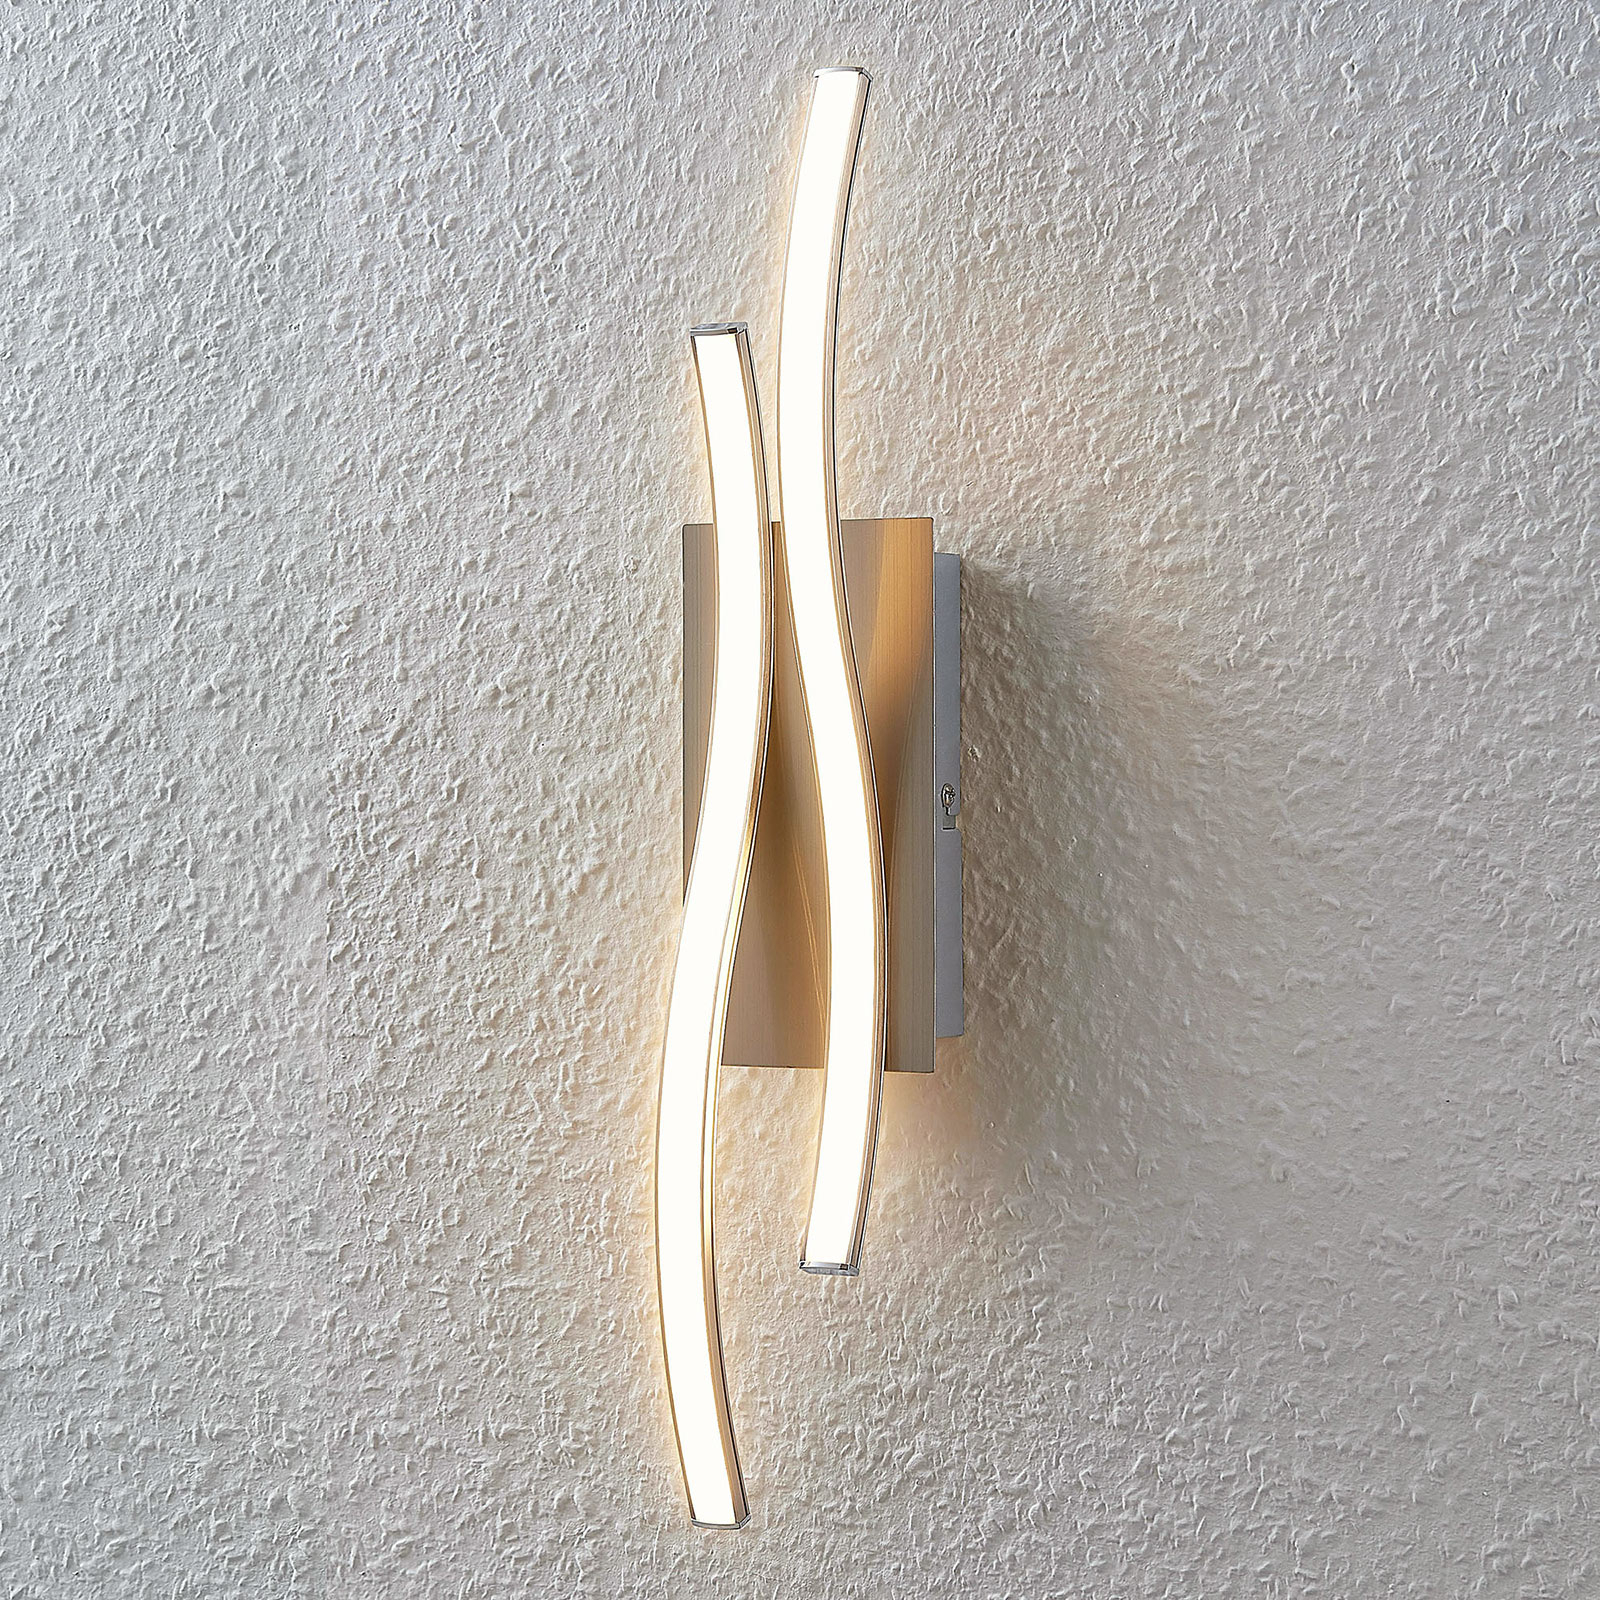 LED-Wandlampe Safia in Wellenform